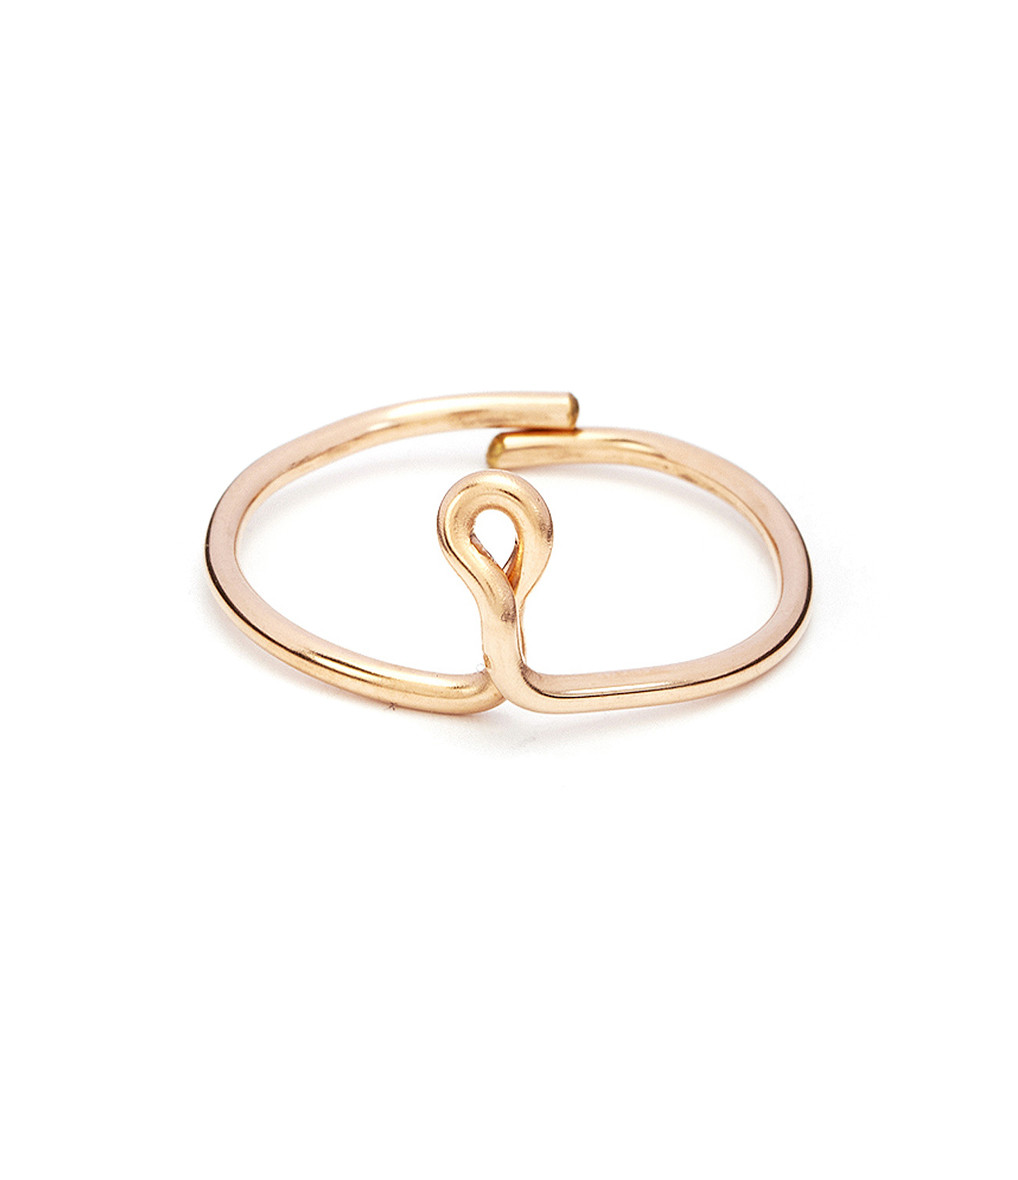 Bague Lettre Fil Gold Filled Rose - Atelier Paulin